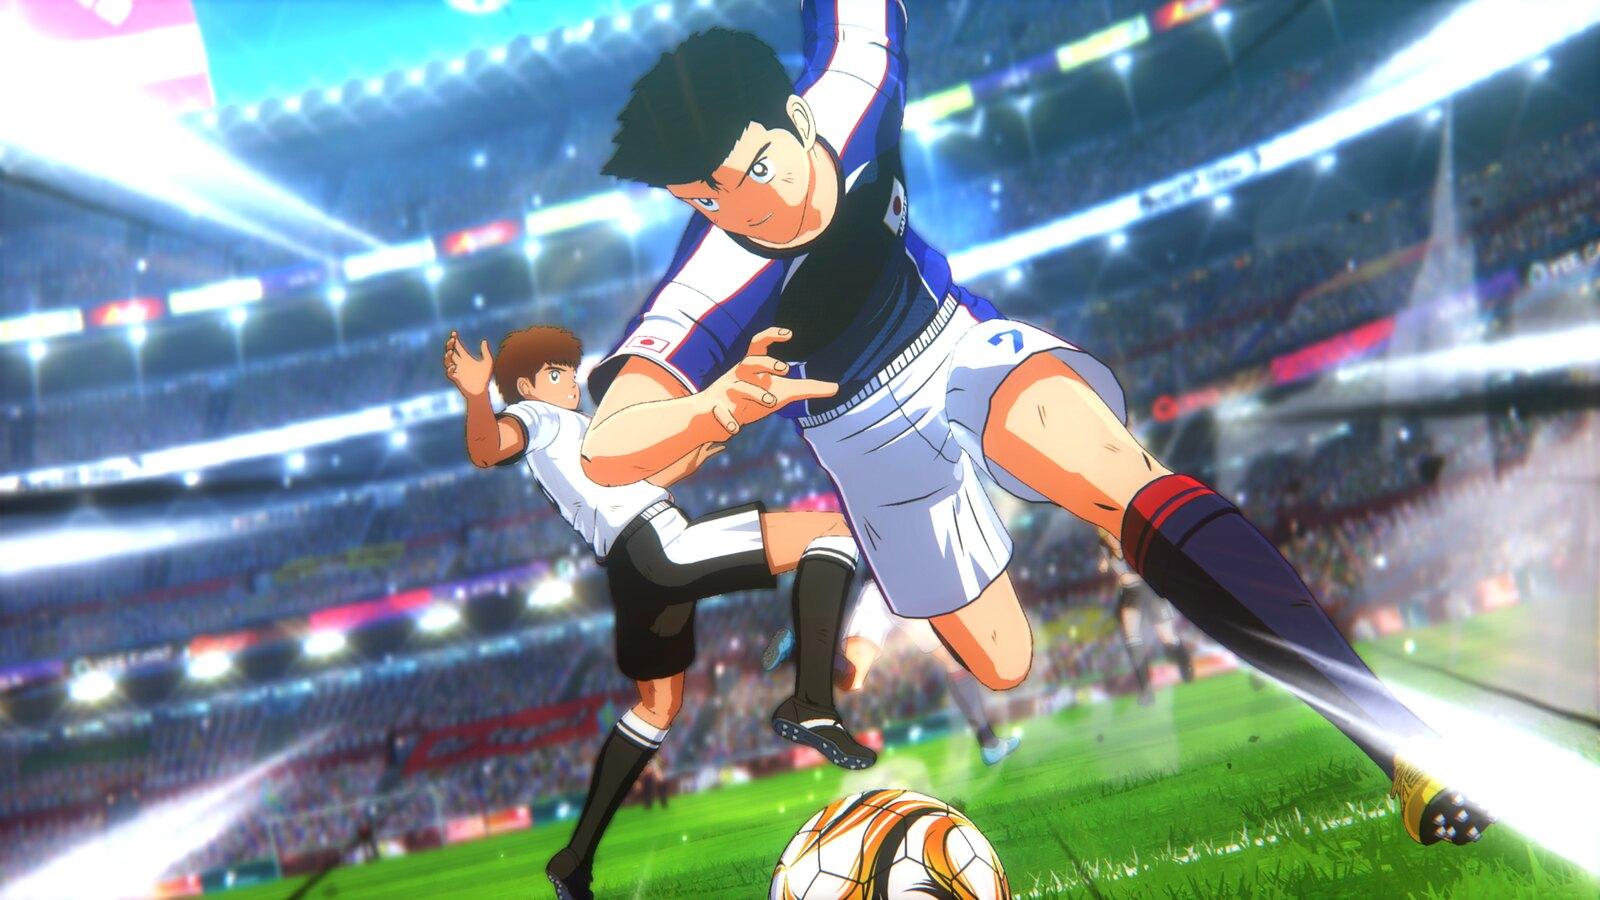 49434890342 8ff89b8a6e h - Captain Tsubasa: Rise of new Champions bringt Arcade-Action ins Wohnzimmer